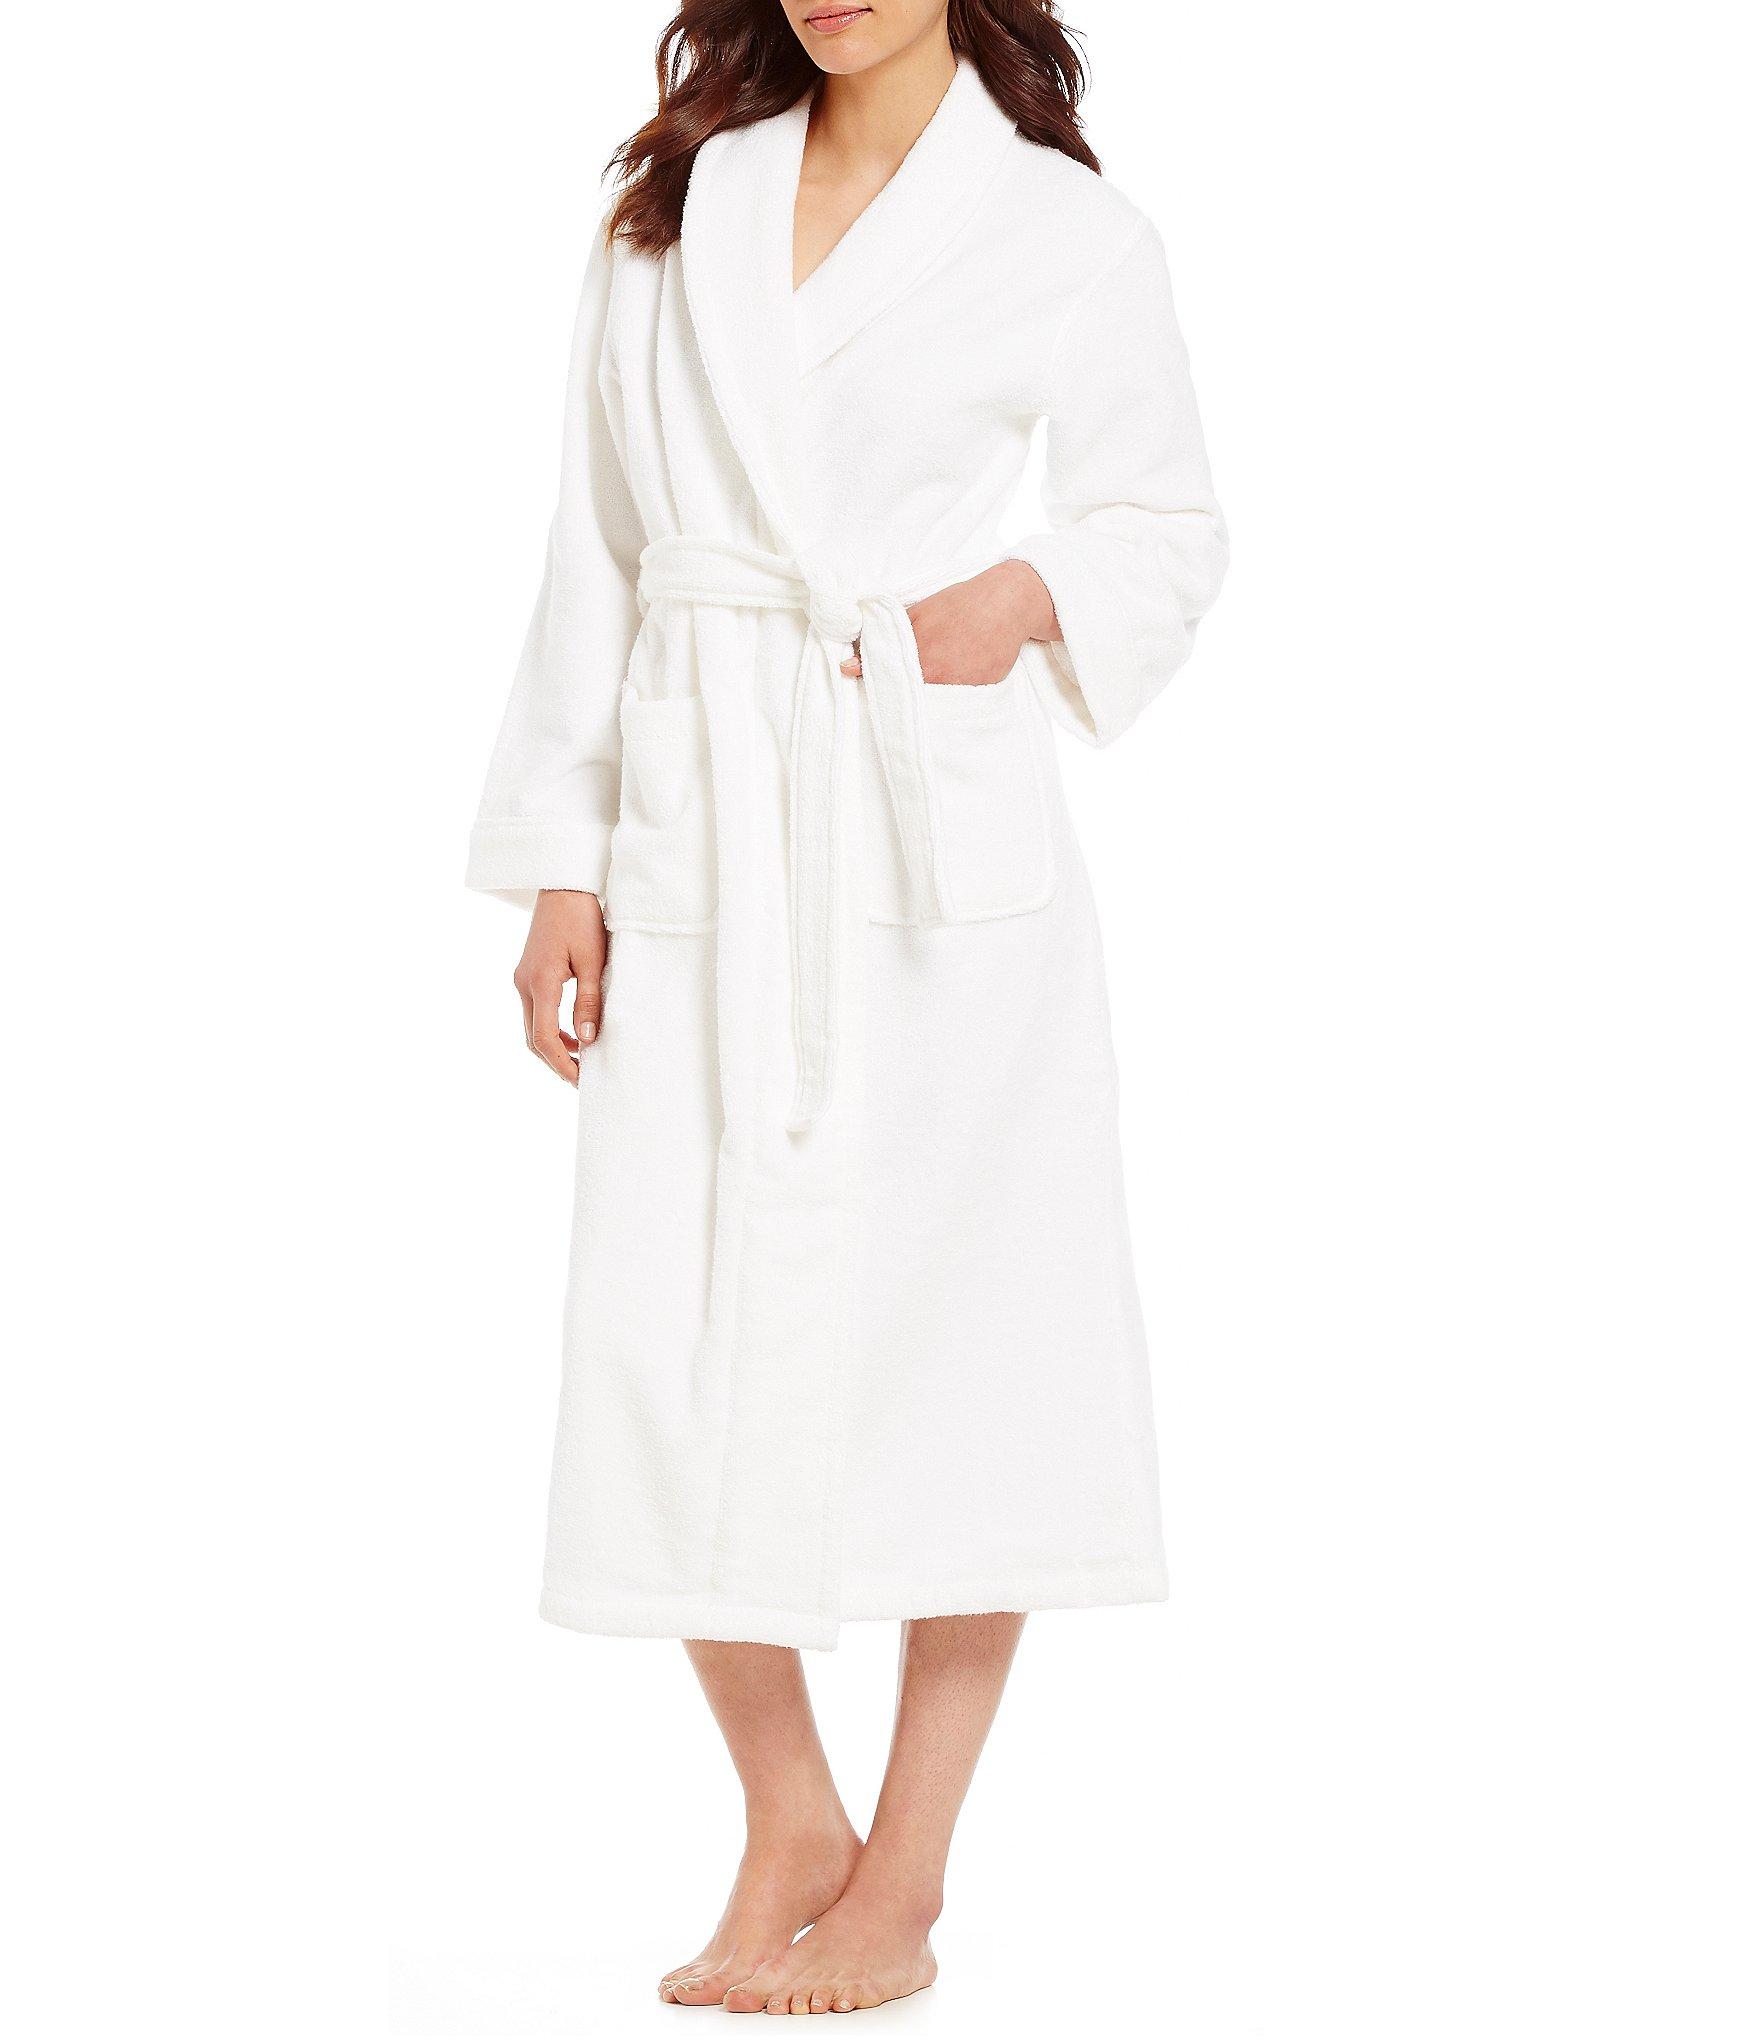 White Women S Lounge Intimate Lingerie Robes Dillard S